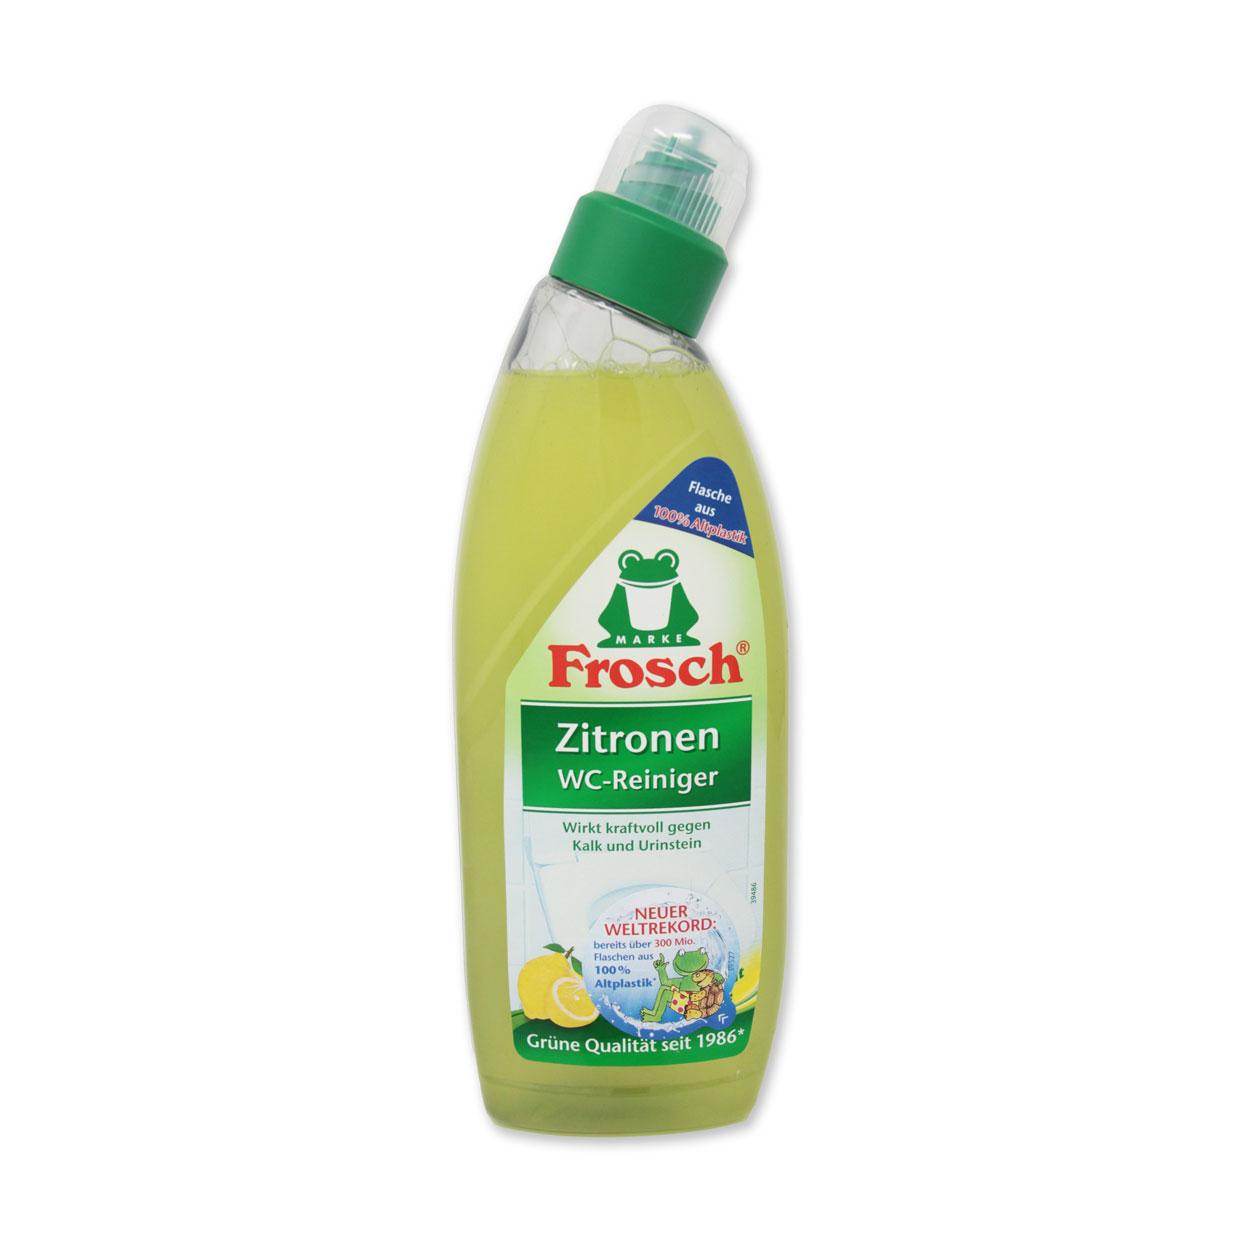 Frosch Zitronen-WC-Reiniger - 750 ml - Flasche